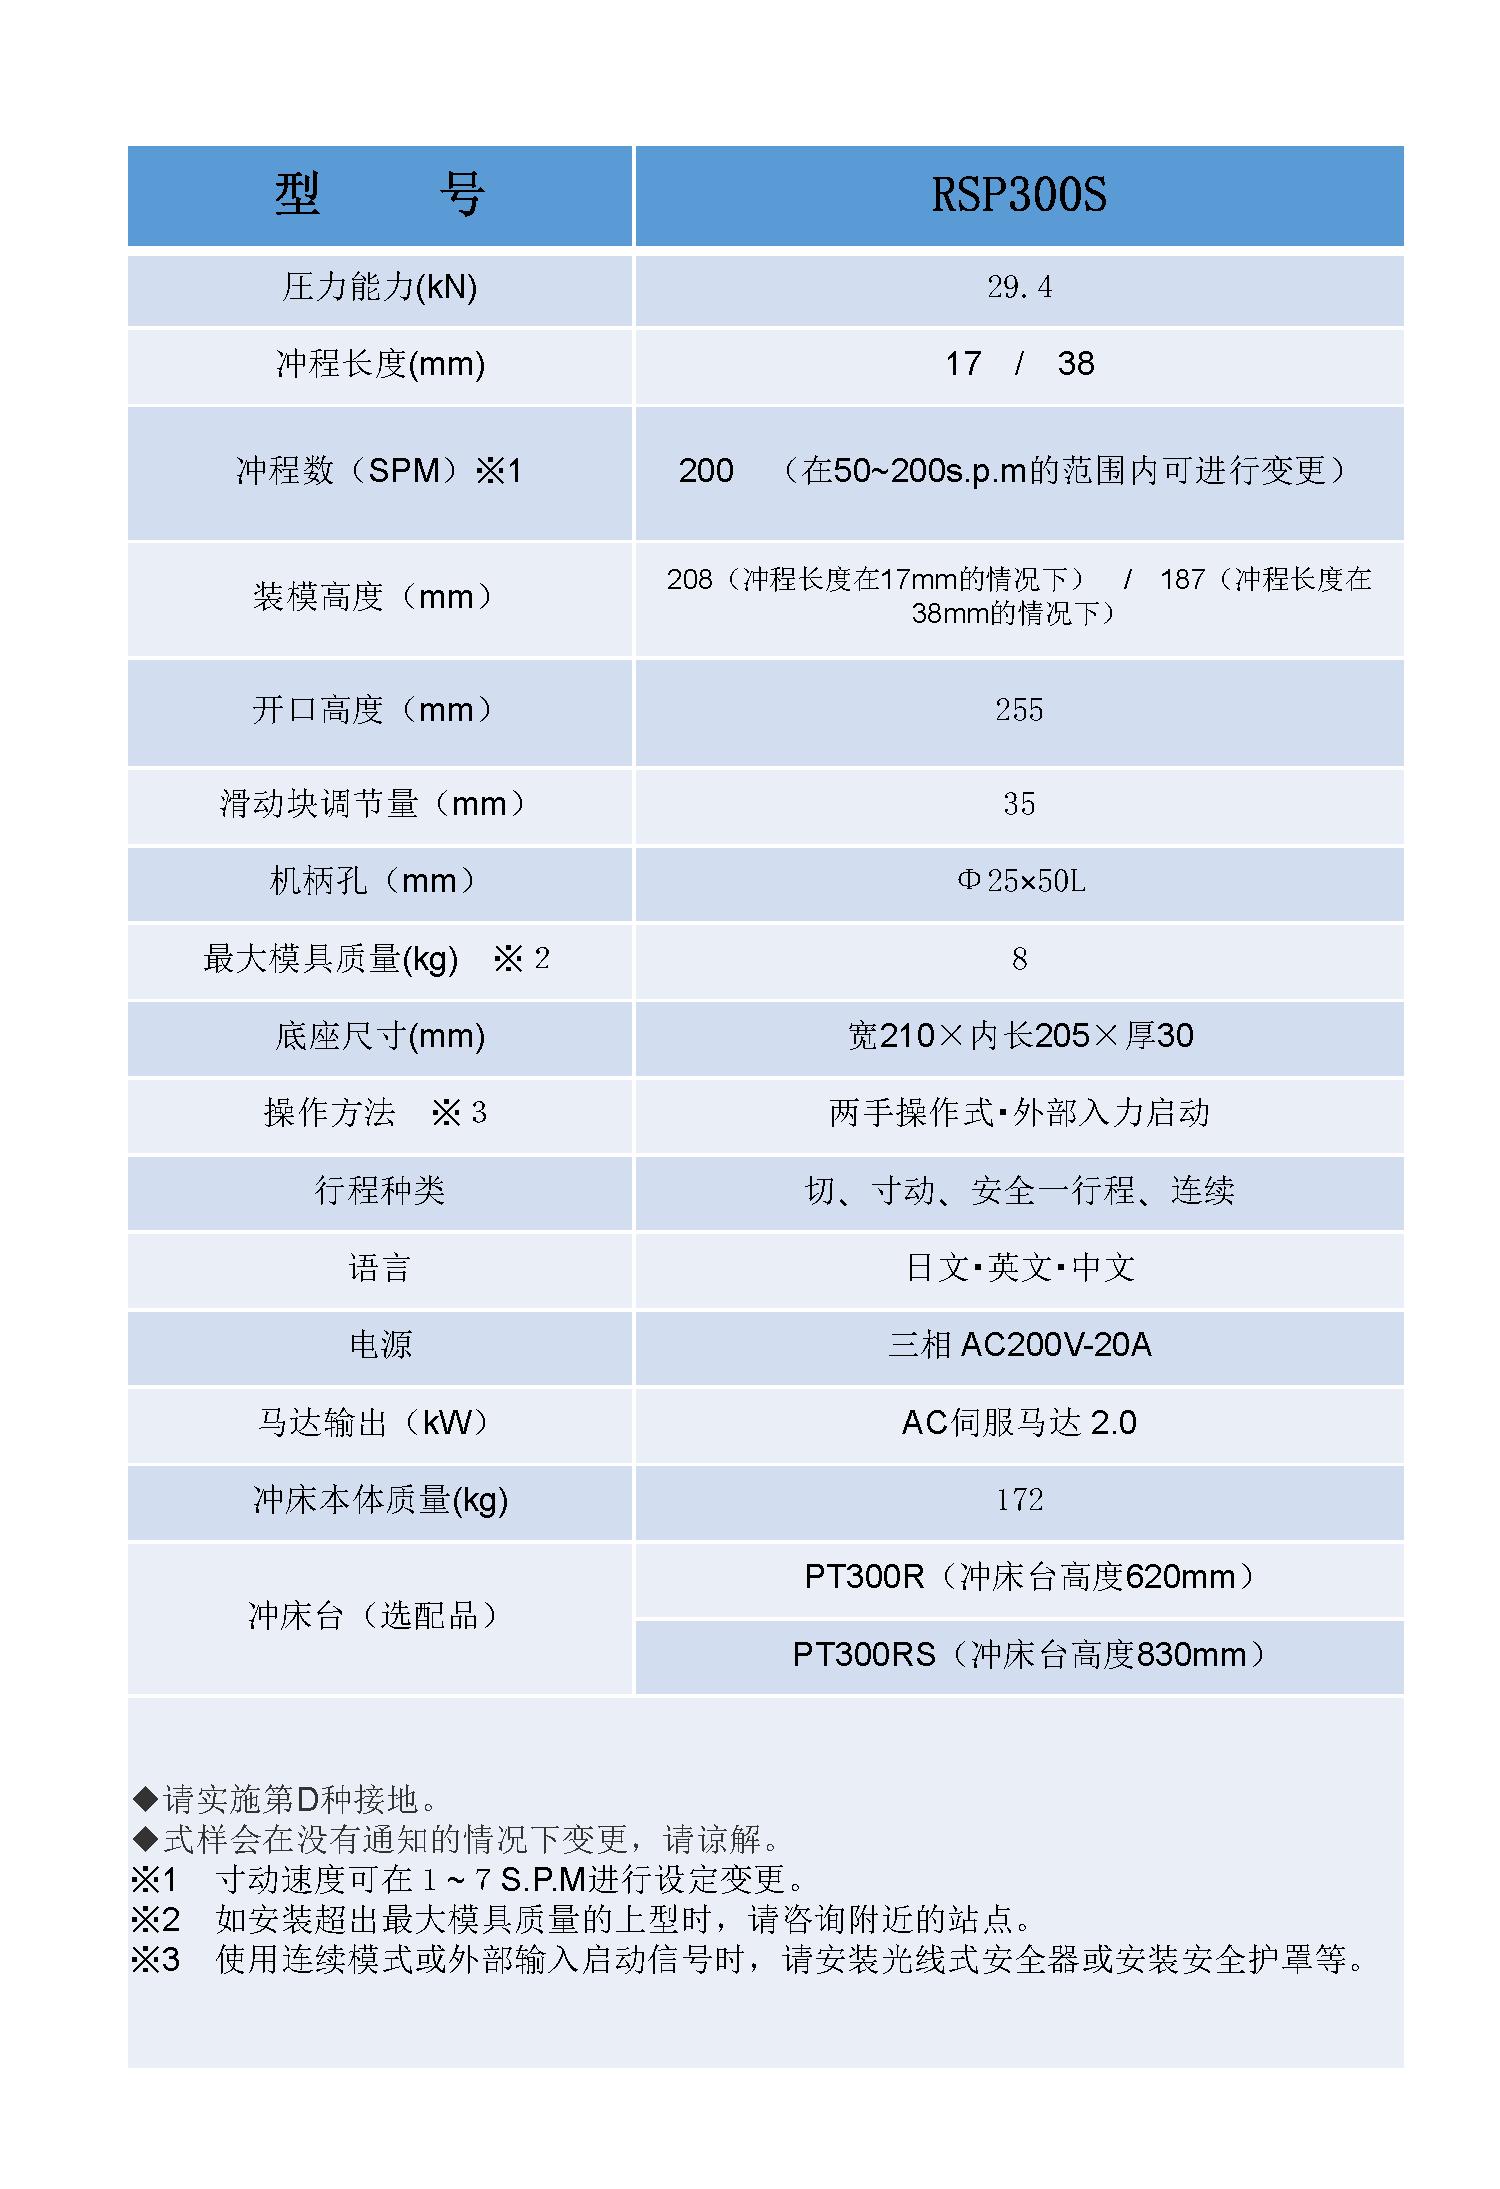 RSP300S_仕様_D - 中文.png